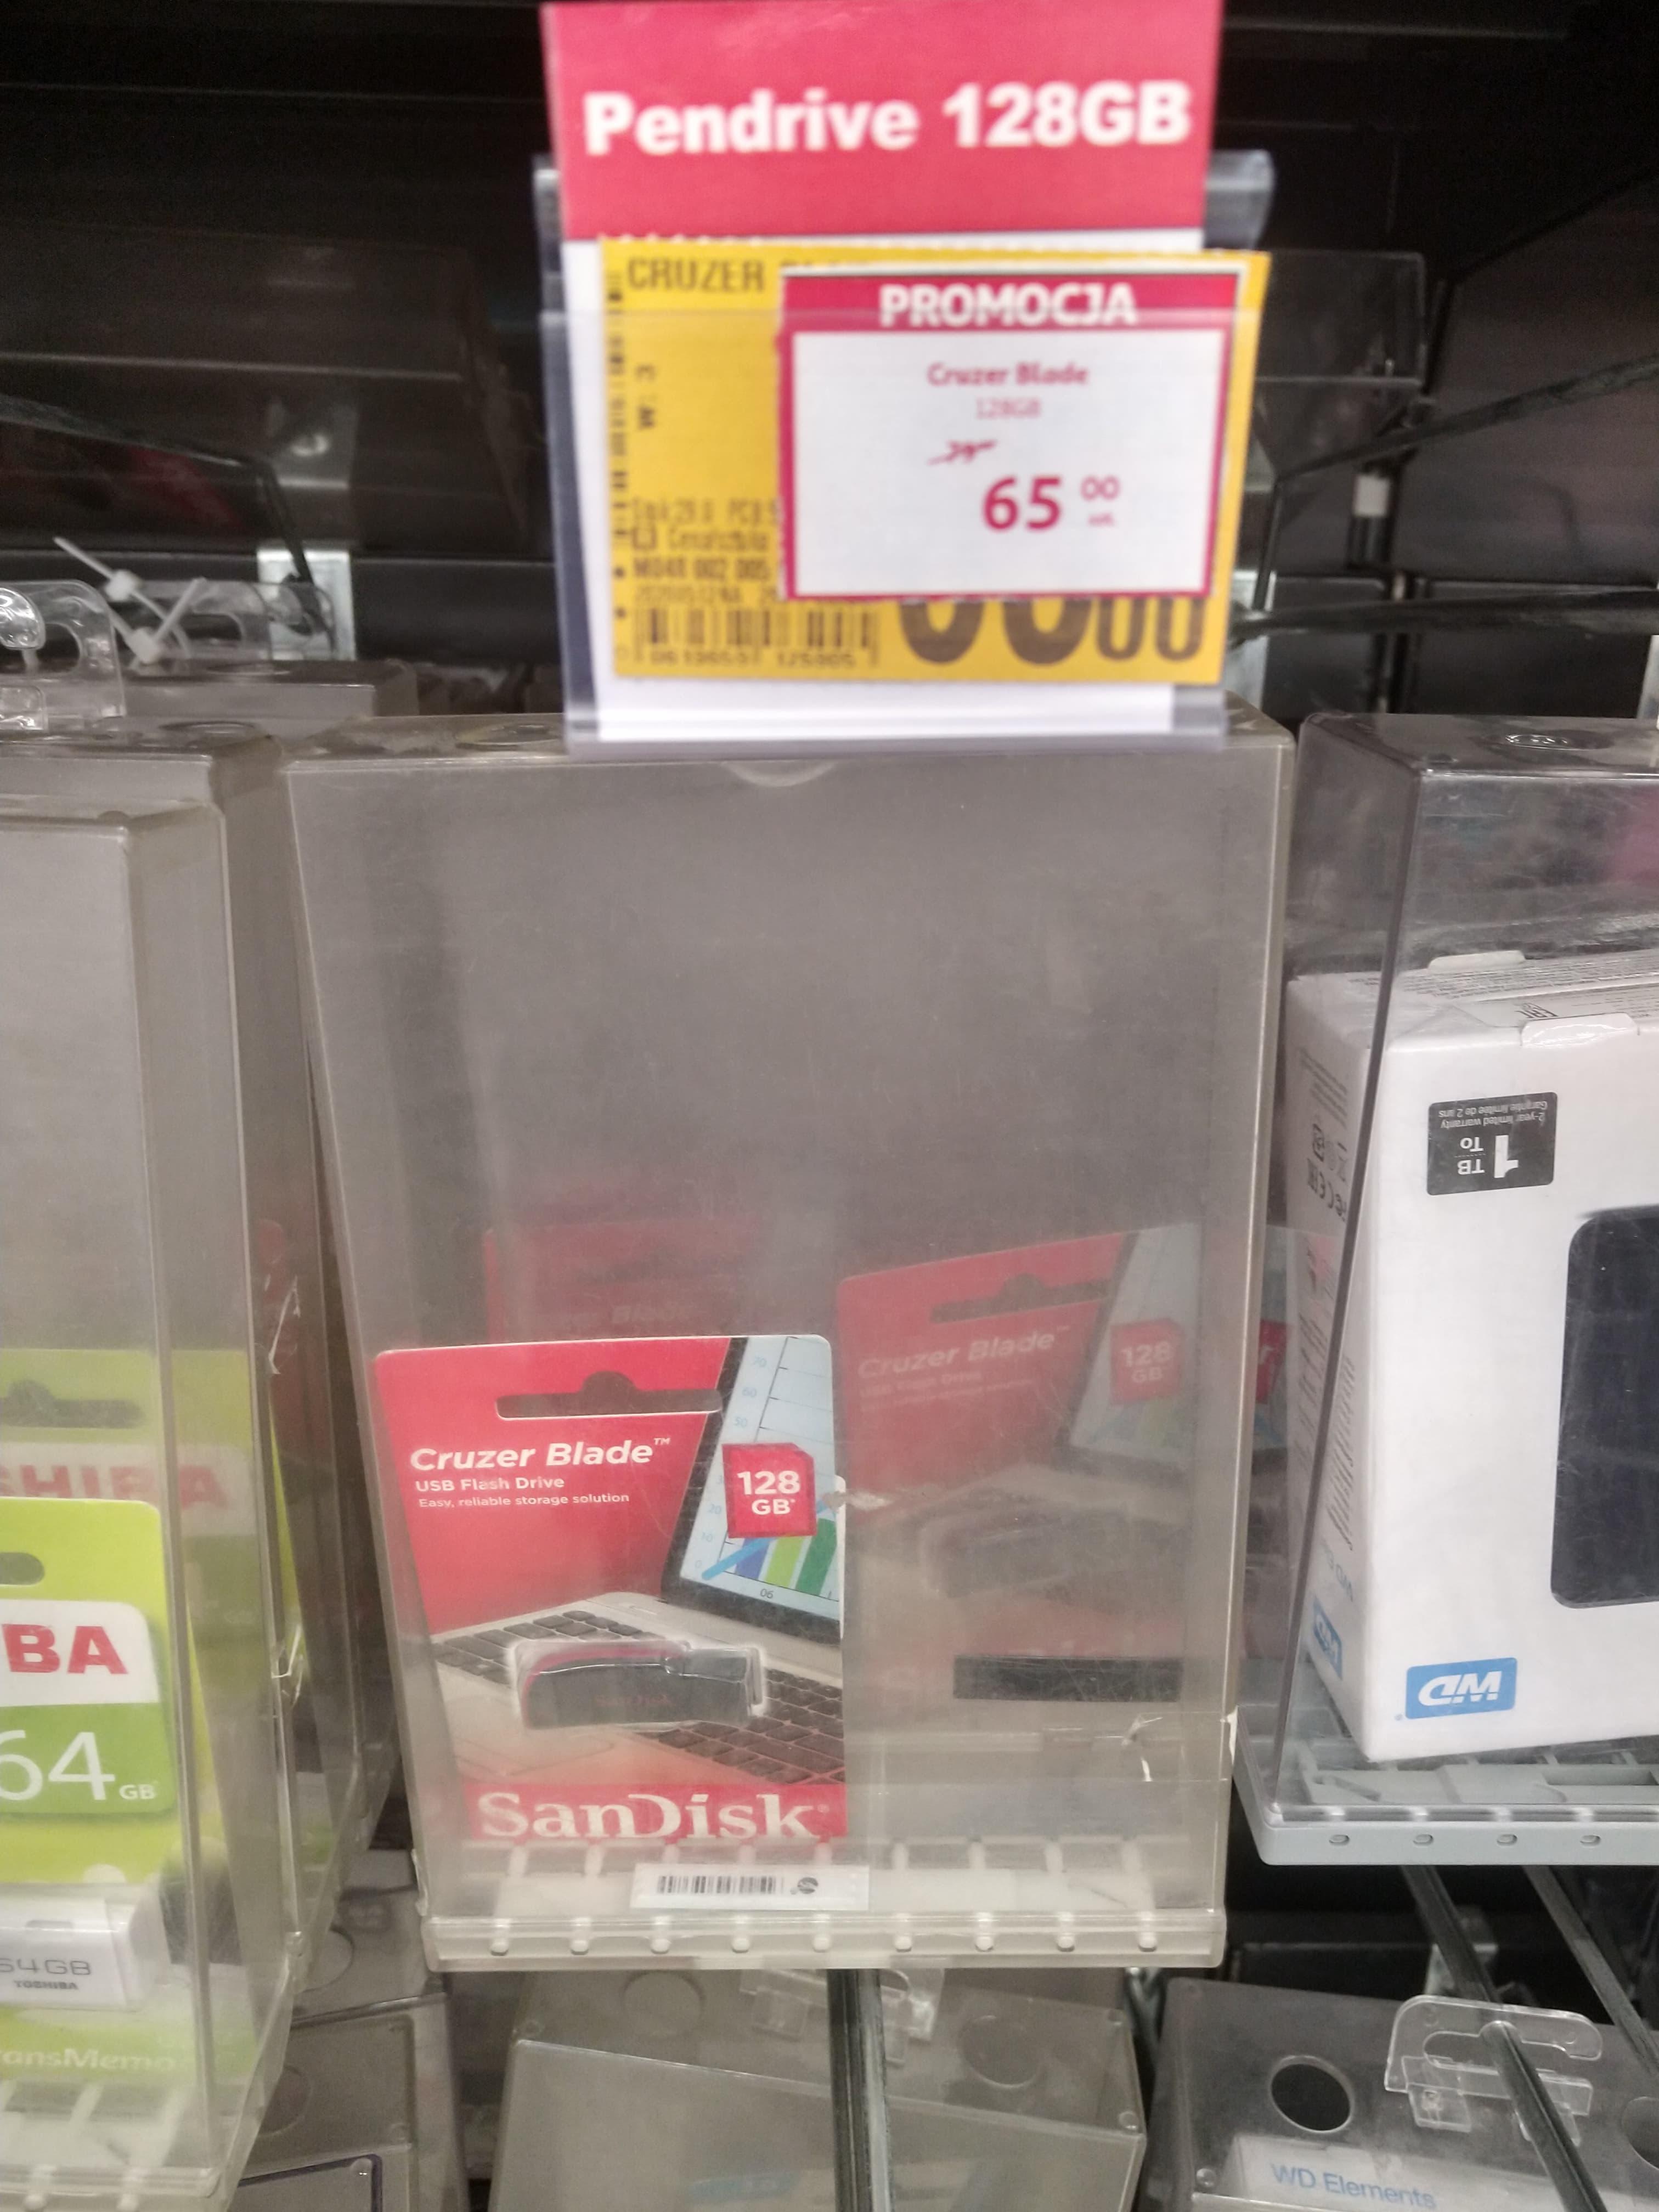 Sandisk Cruzer Blade Pendrive 128GB (USB 2.0) Auchan Lublin